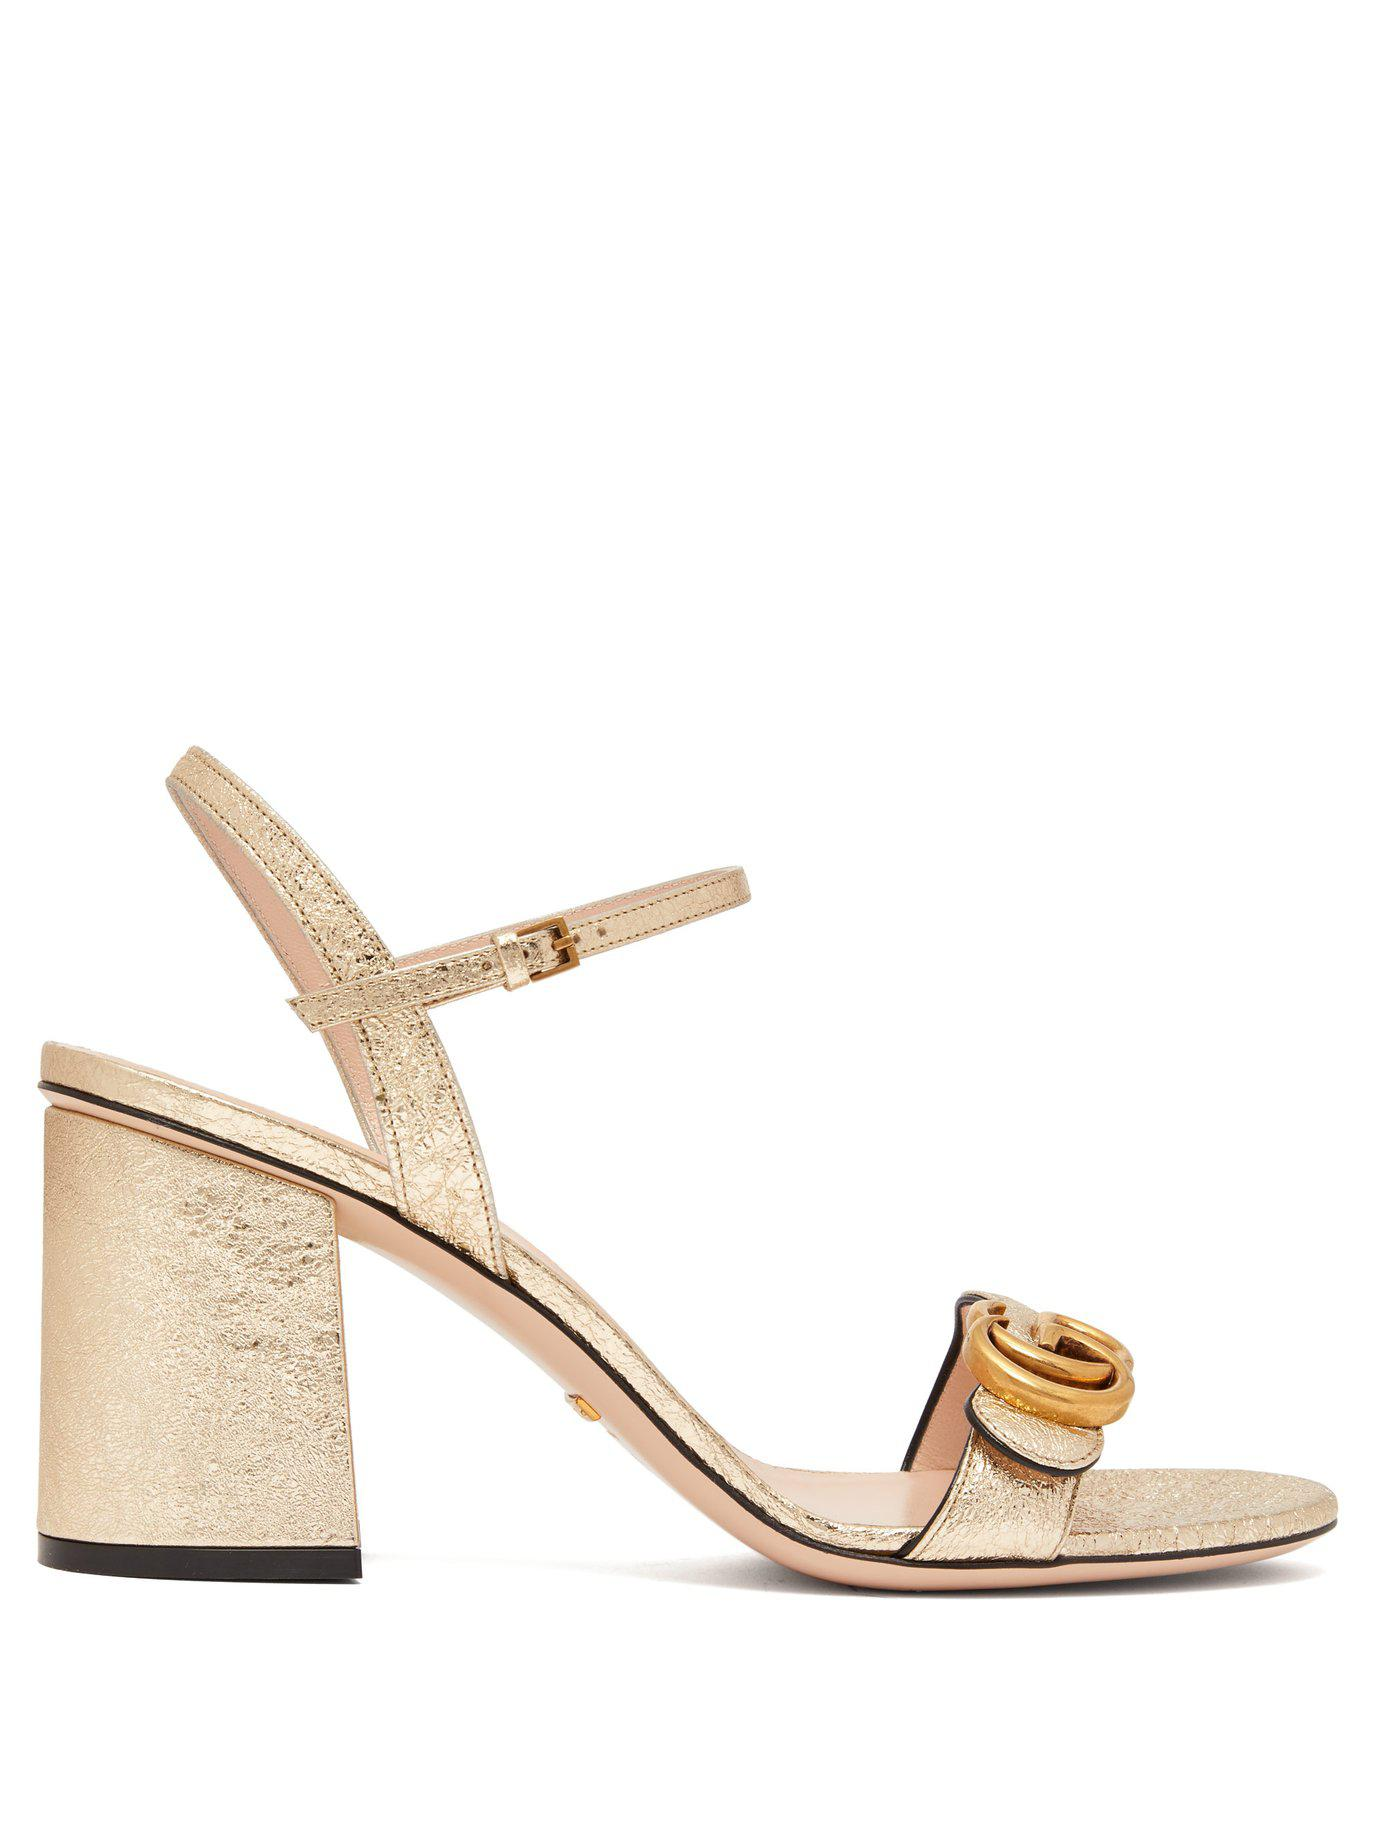 a7e545b9cb6 Lyst - Gucci Gg Marmont Metallic Leather Sandals in Metallic